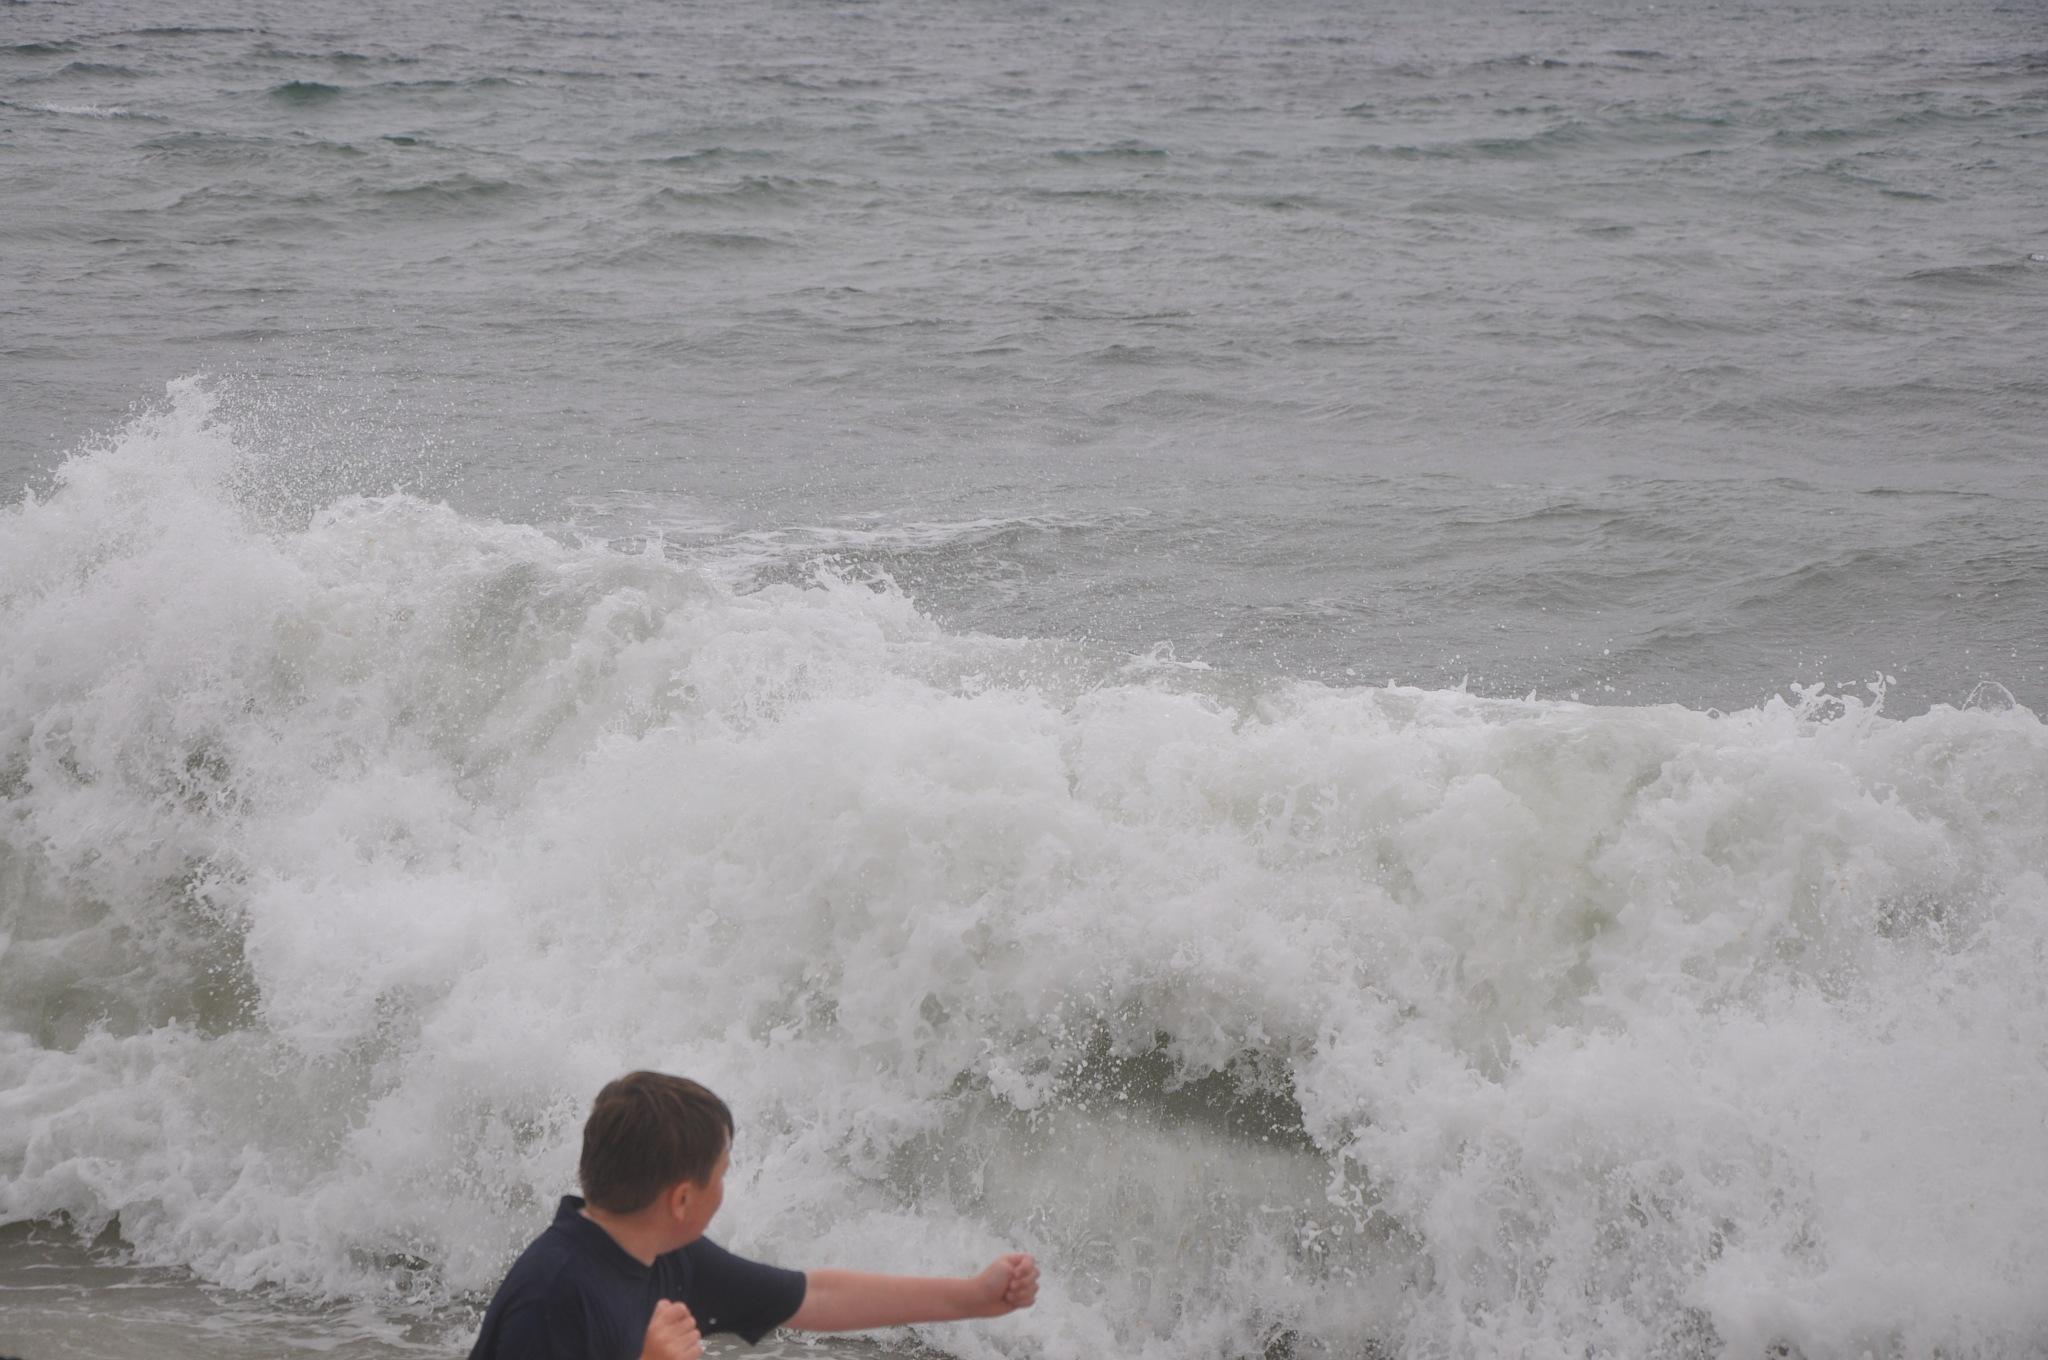 Rough  Surf  ~  Lecount  Hollow  Beach   ~ Welfleet  ~  August 8,  2017 by domenic.silvi